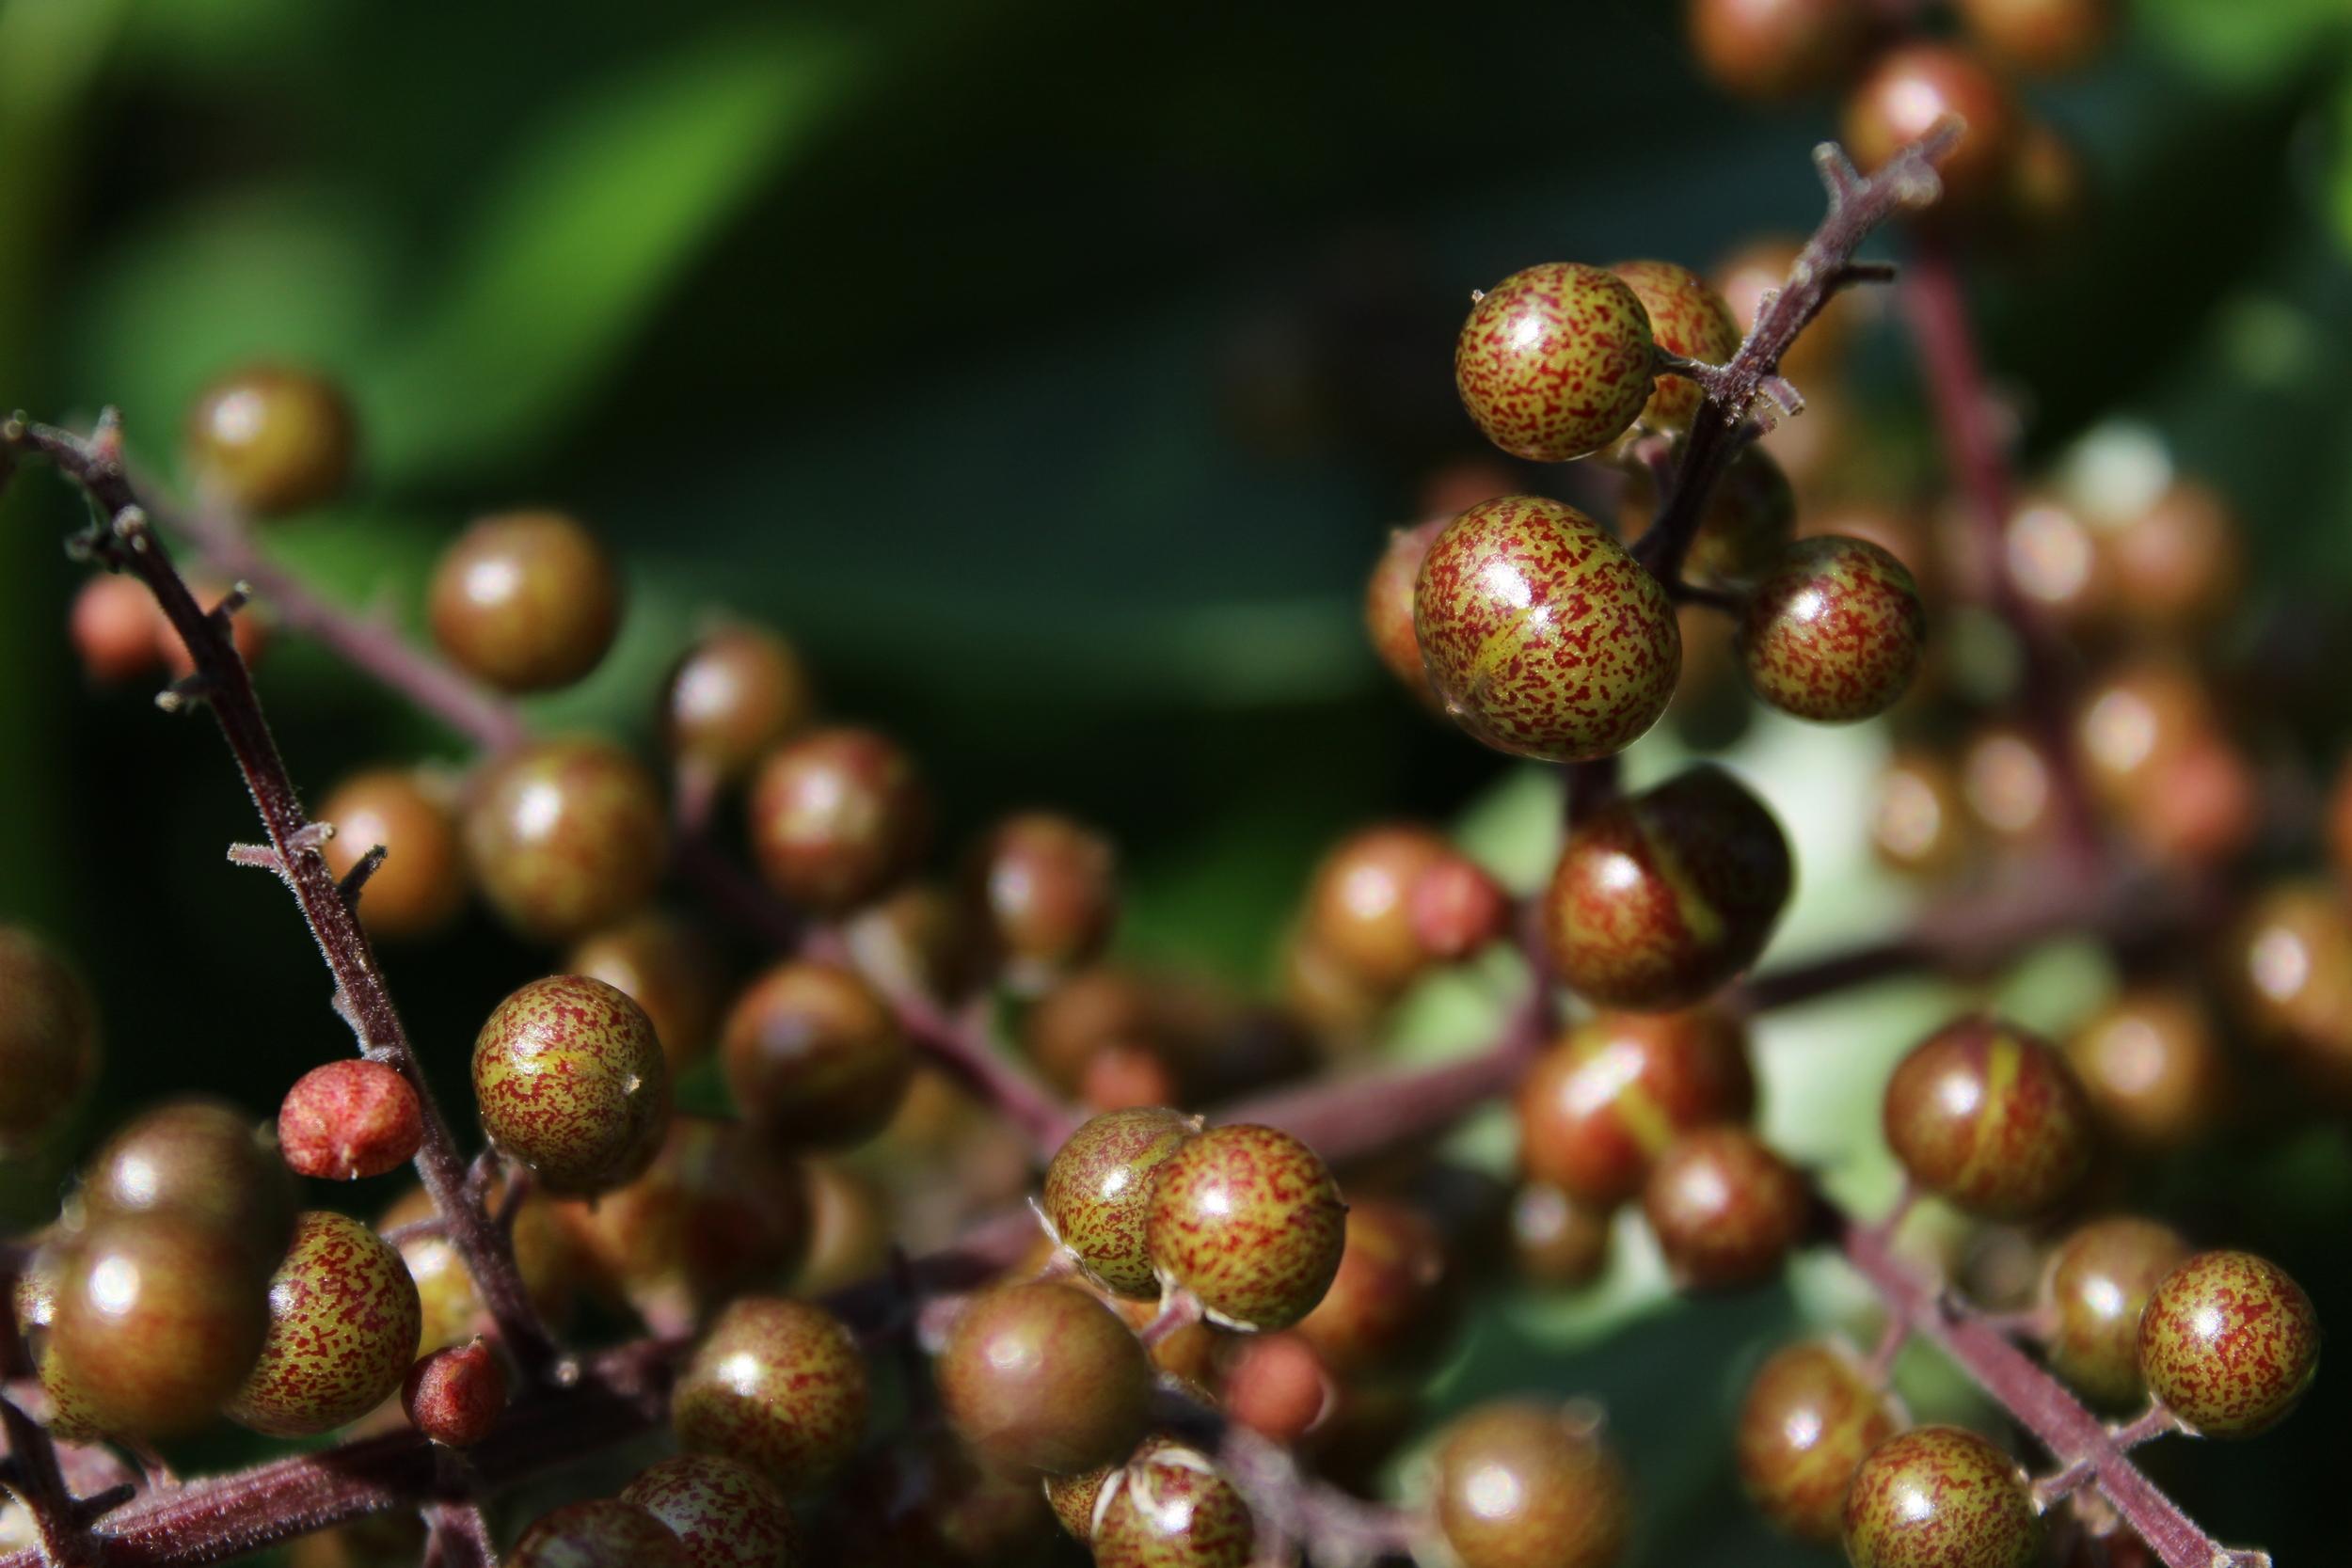 Solomon's Seal berries catching the sun.